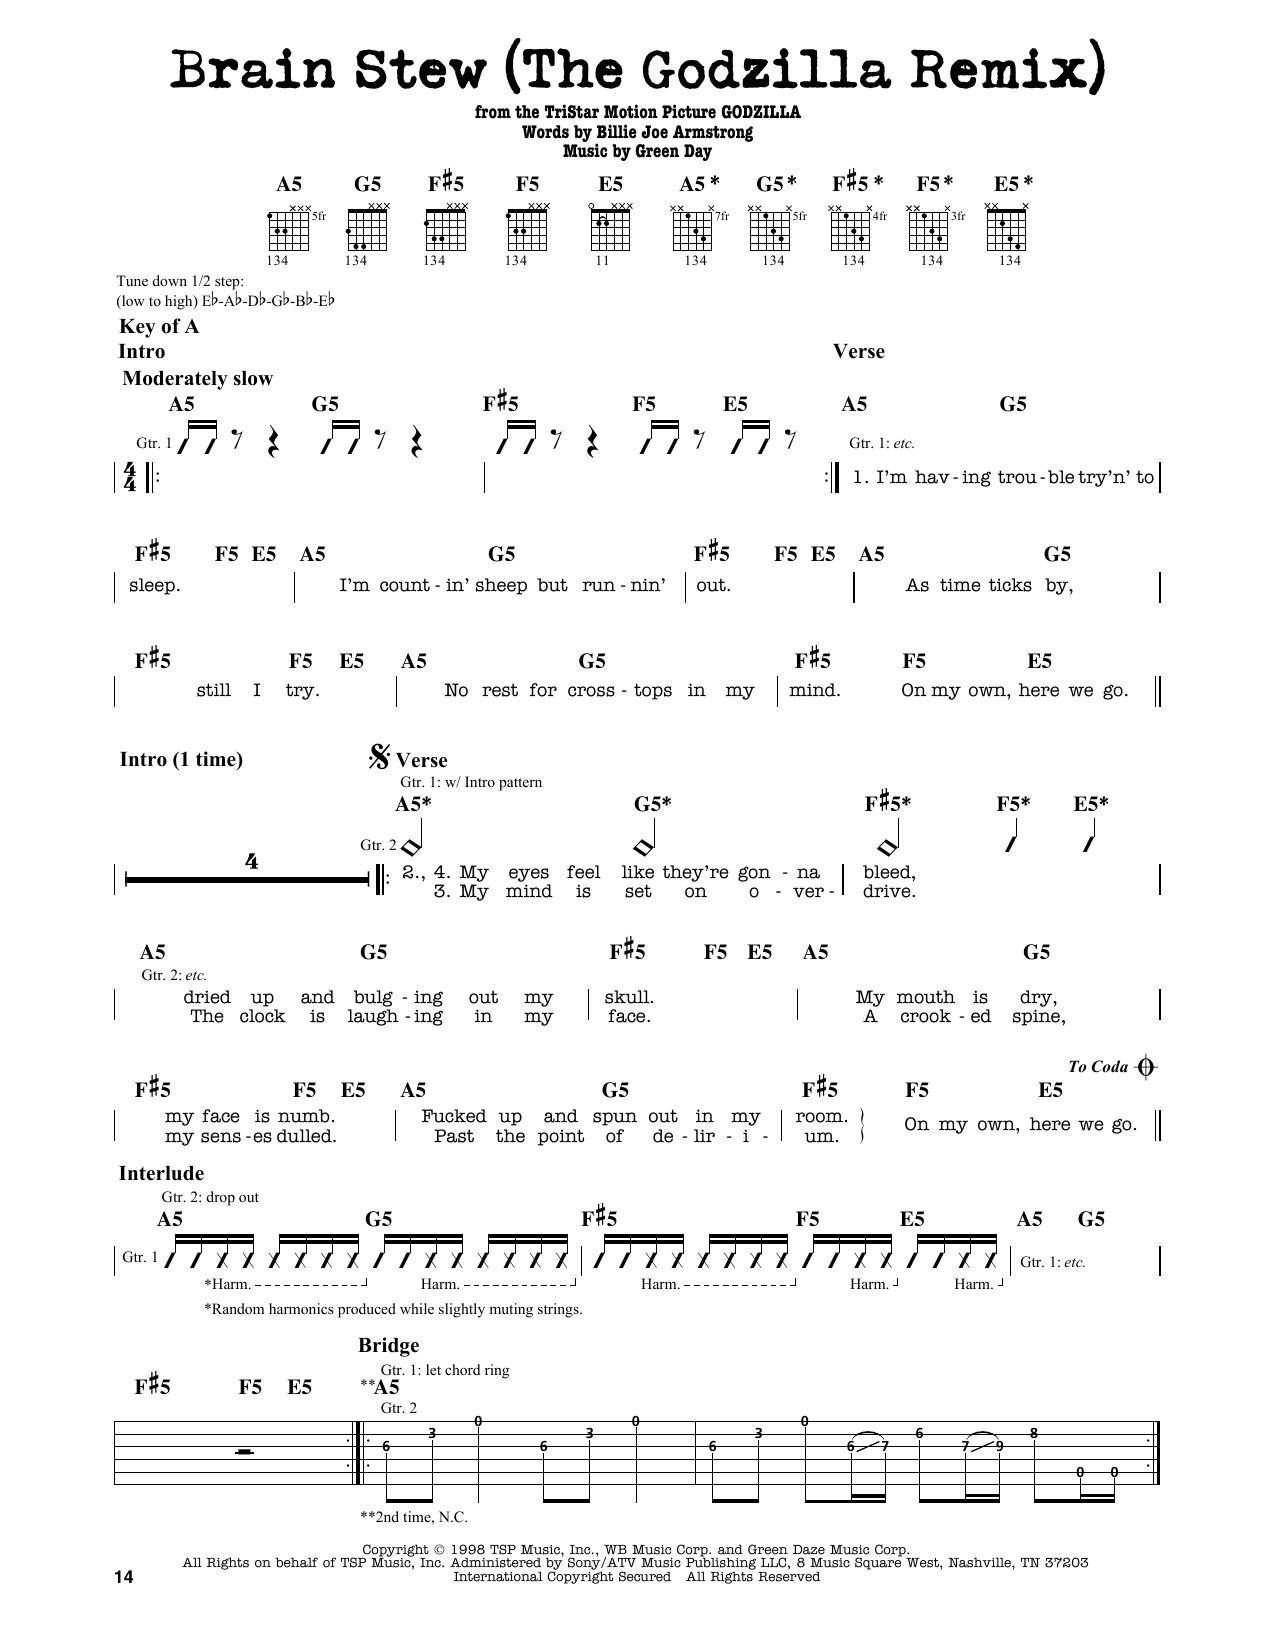 Brain Stew Chords  Brain Stew The Godzilla Remix by Green Day Guitar Lead